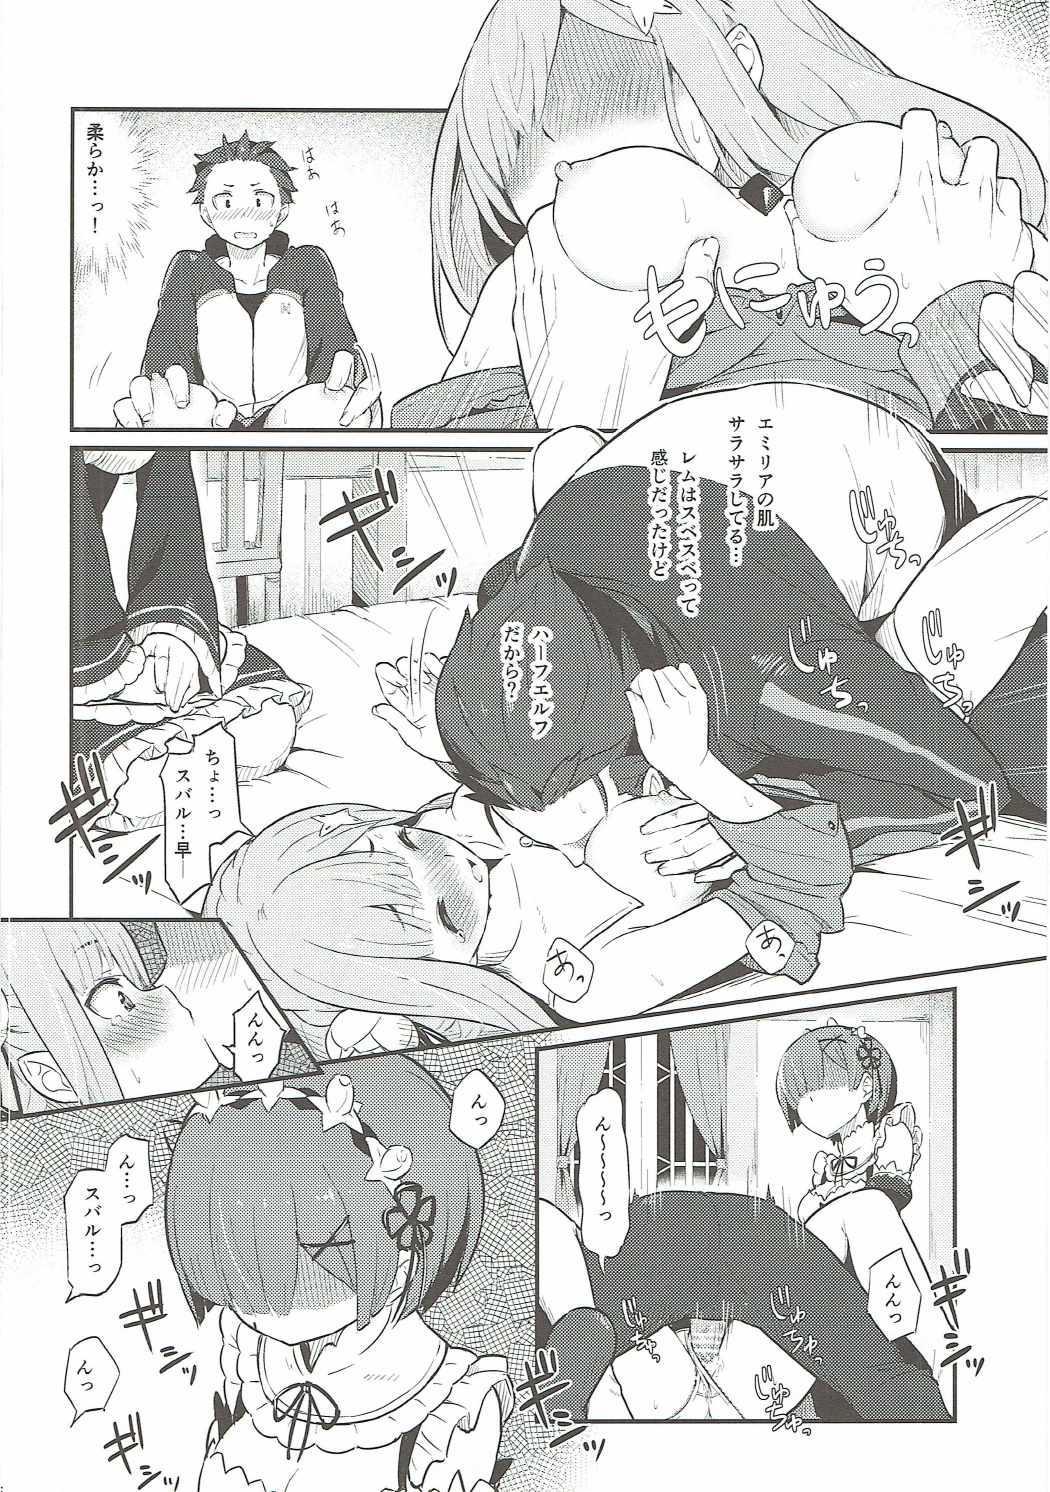 Rem no Emilia Kuttsuke Daisakusen 16